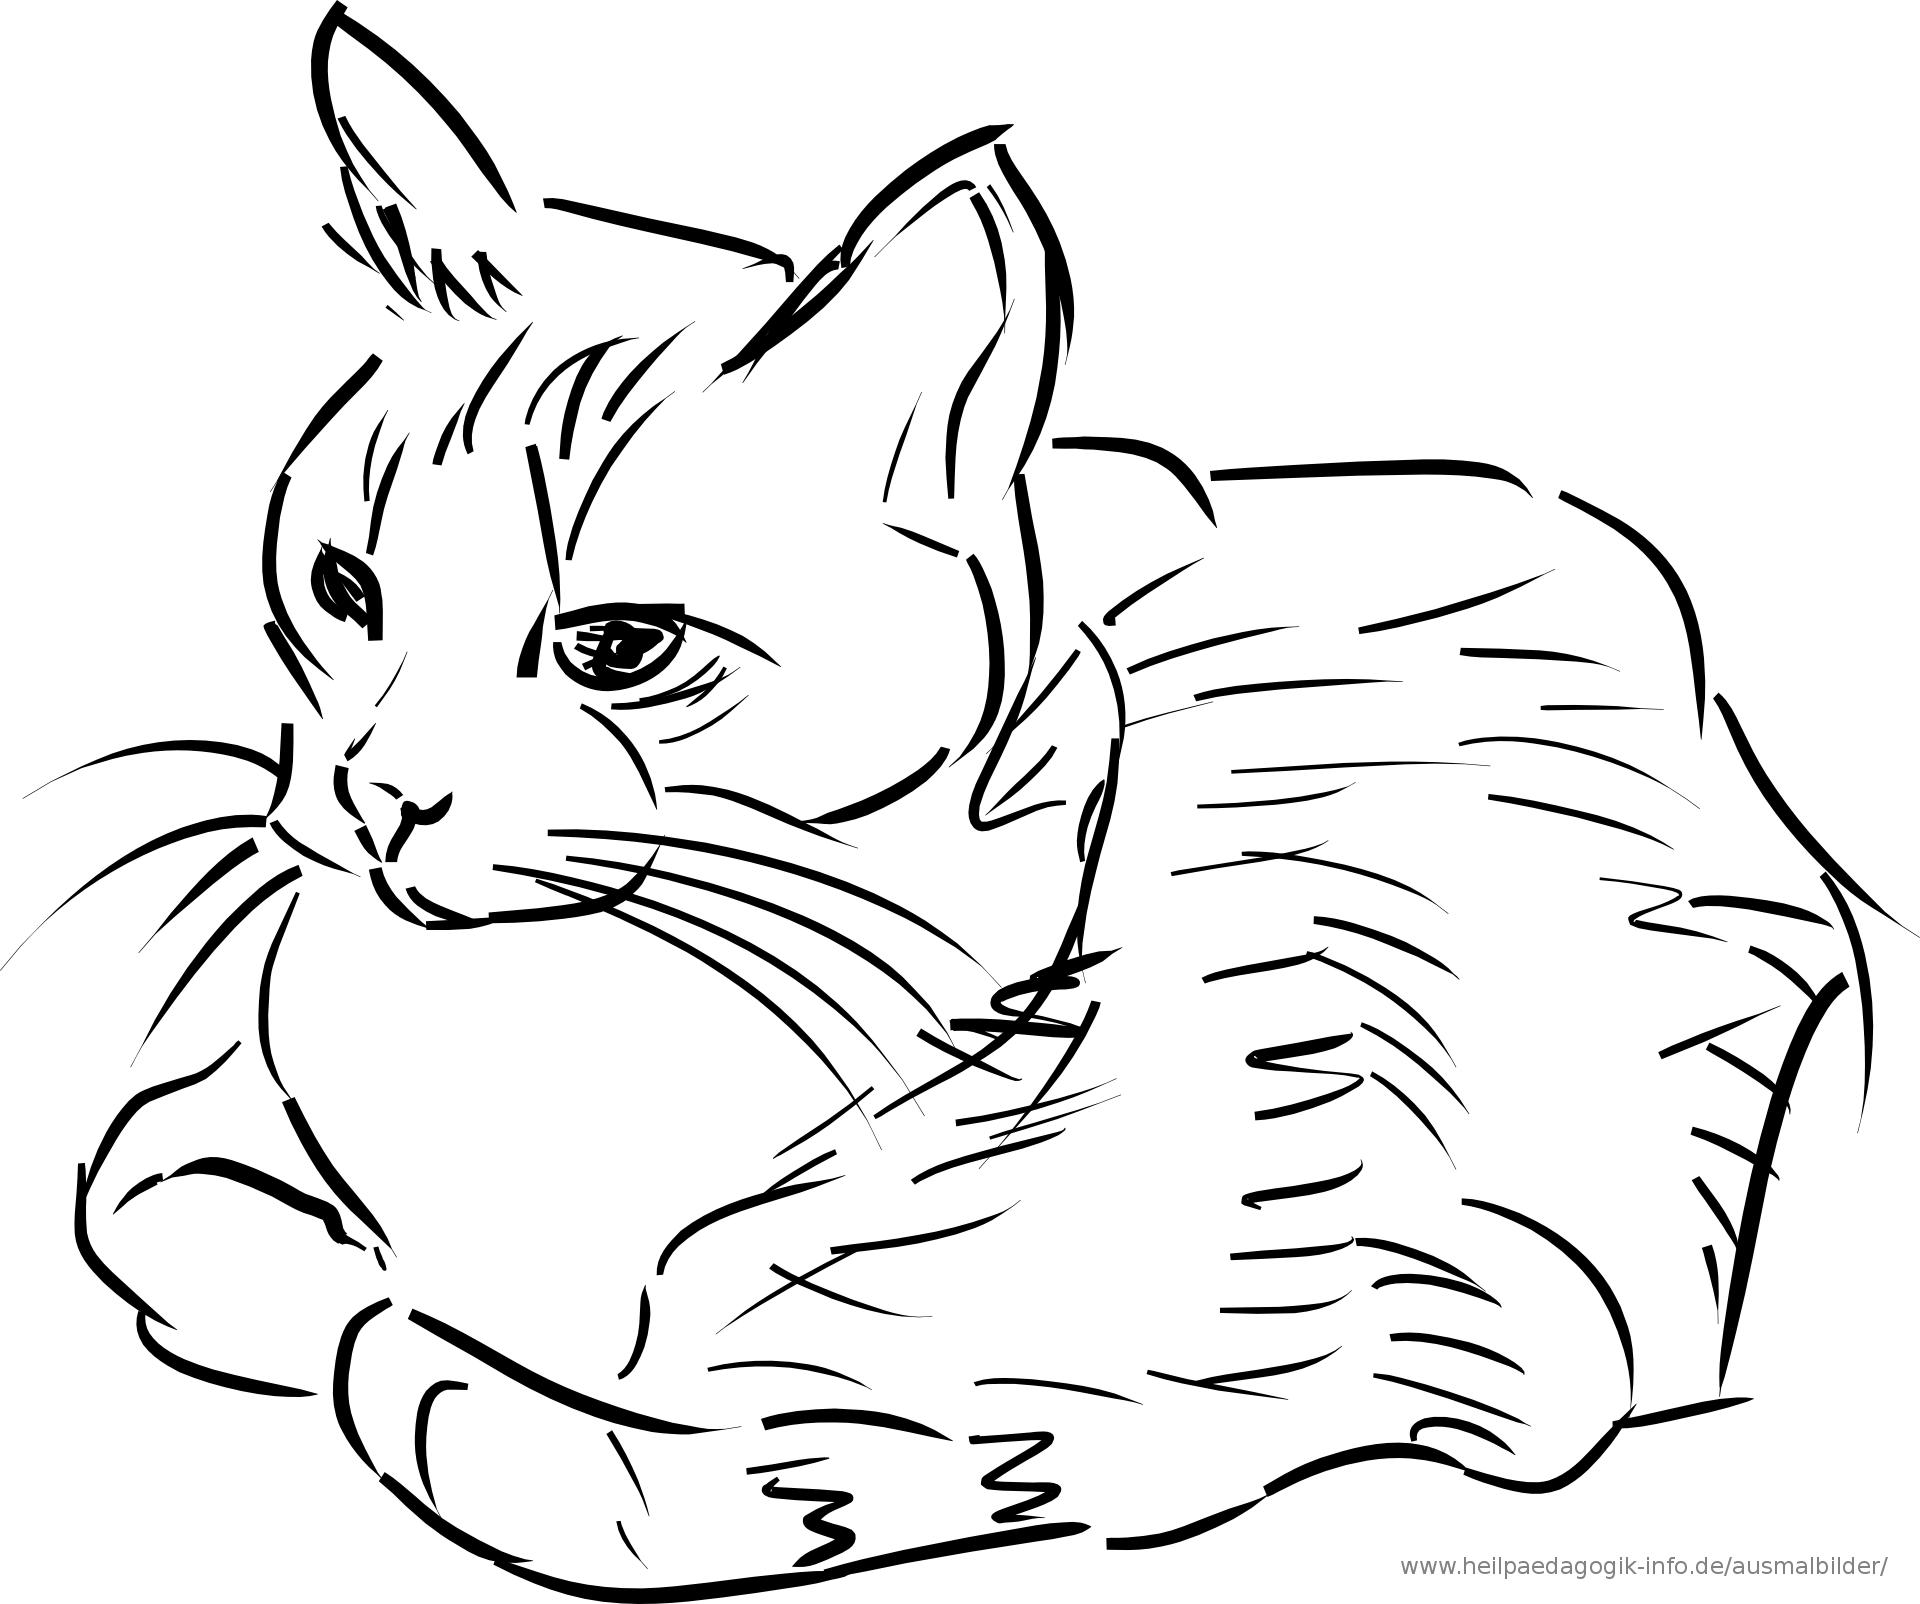 kätzchen ausmalbild 8  Ausmalbilder katzen, Ausmalbilder, Ausmalen